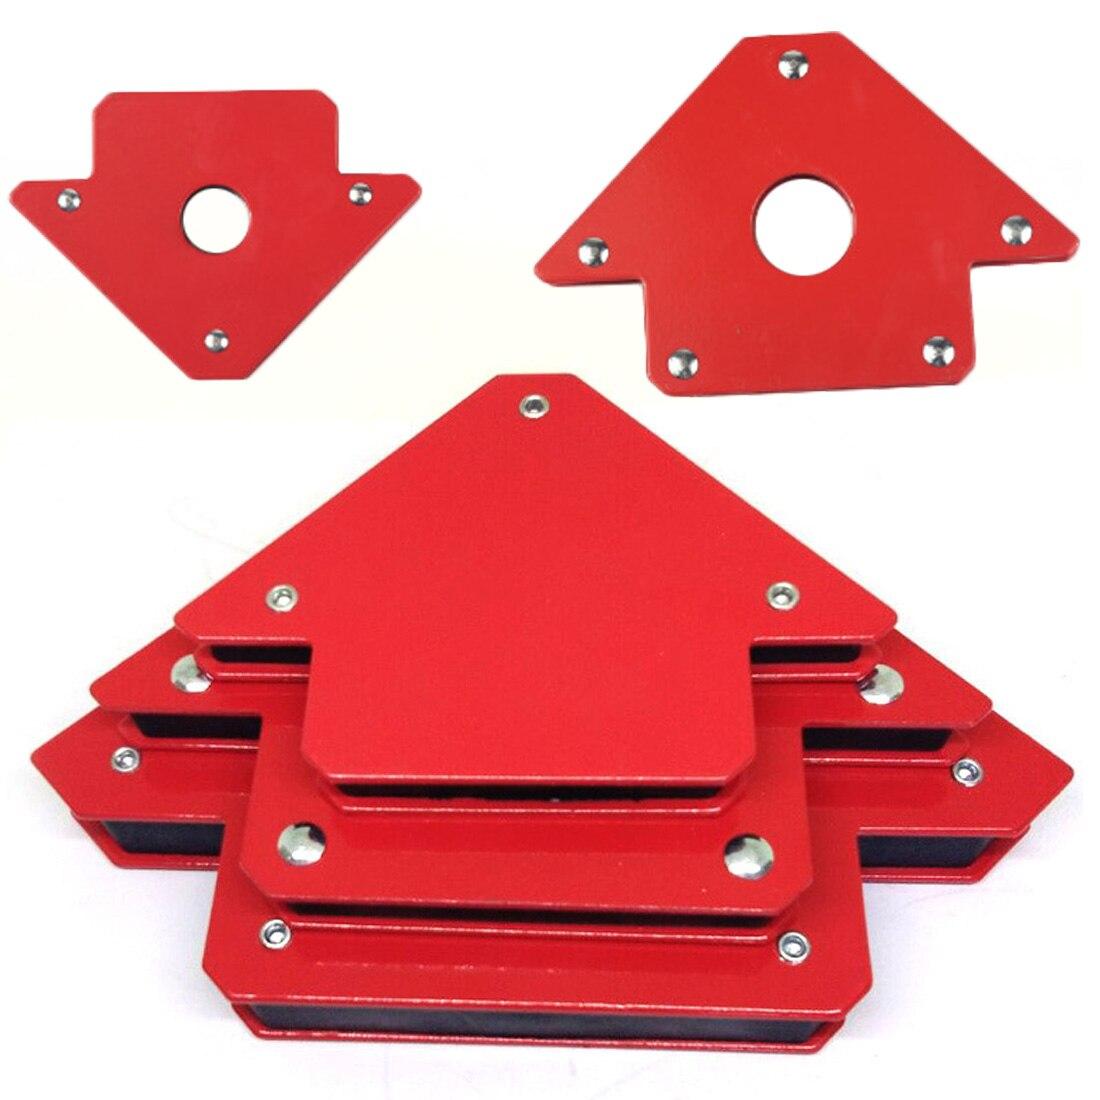 25LB Triangle  Arrow Welder Positioner Power Tool Accessories Soldering Locator Strong Magnet Welding Magnetic Holder